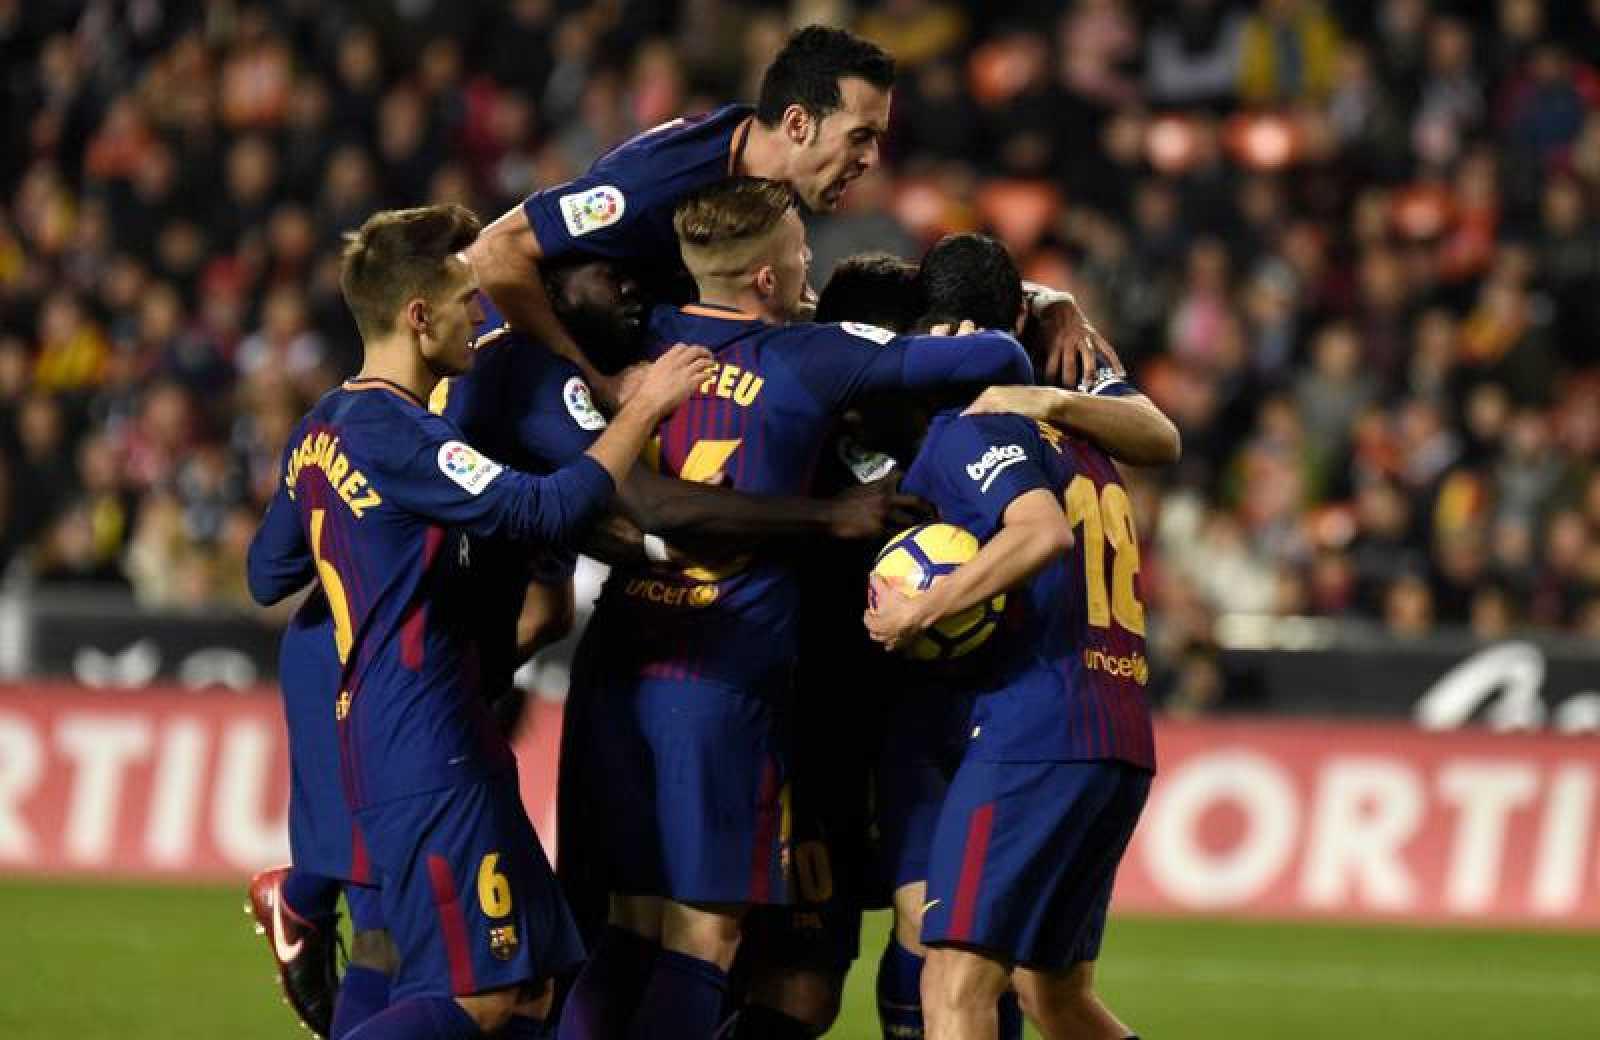 Los jugadores celebran el gol del empate, obra de Jordi Alba.